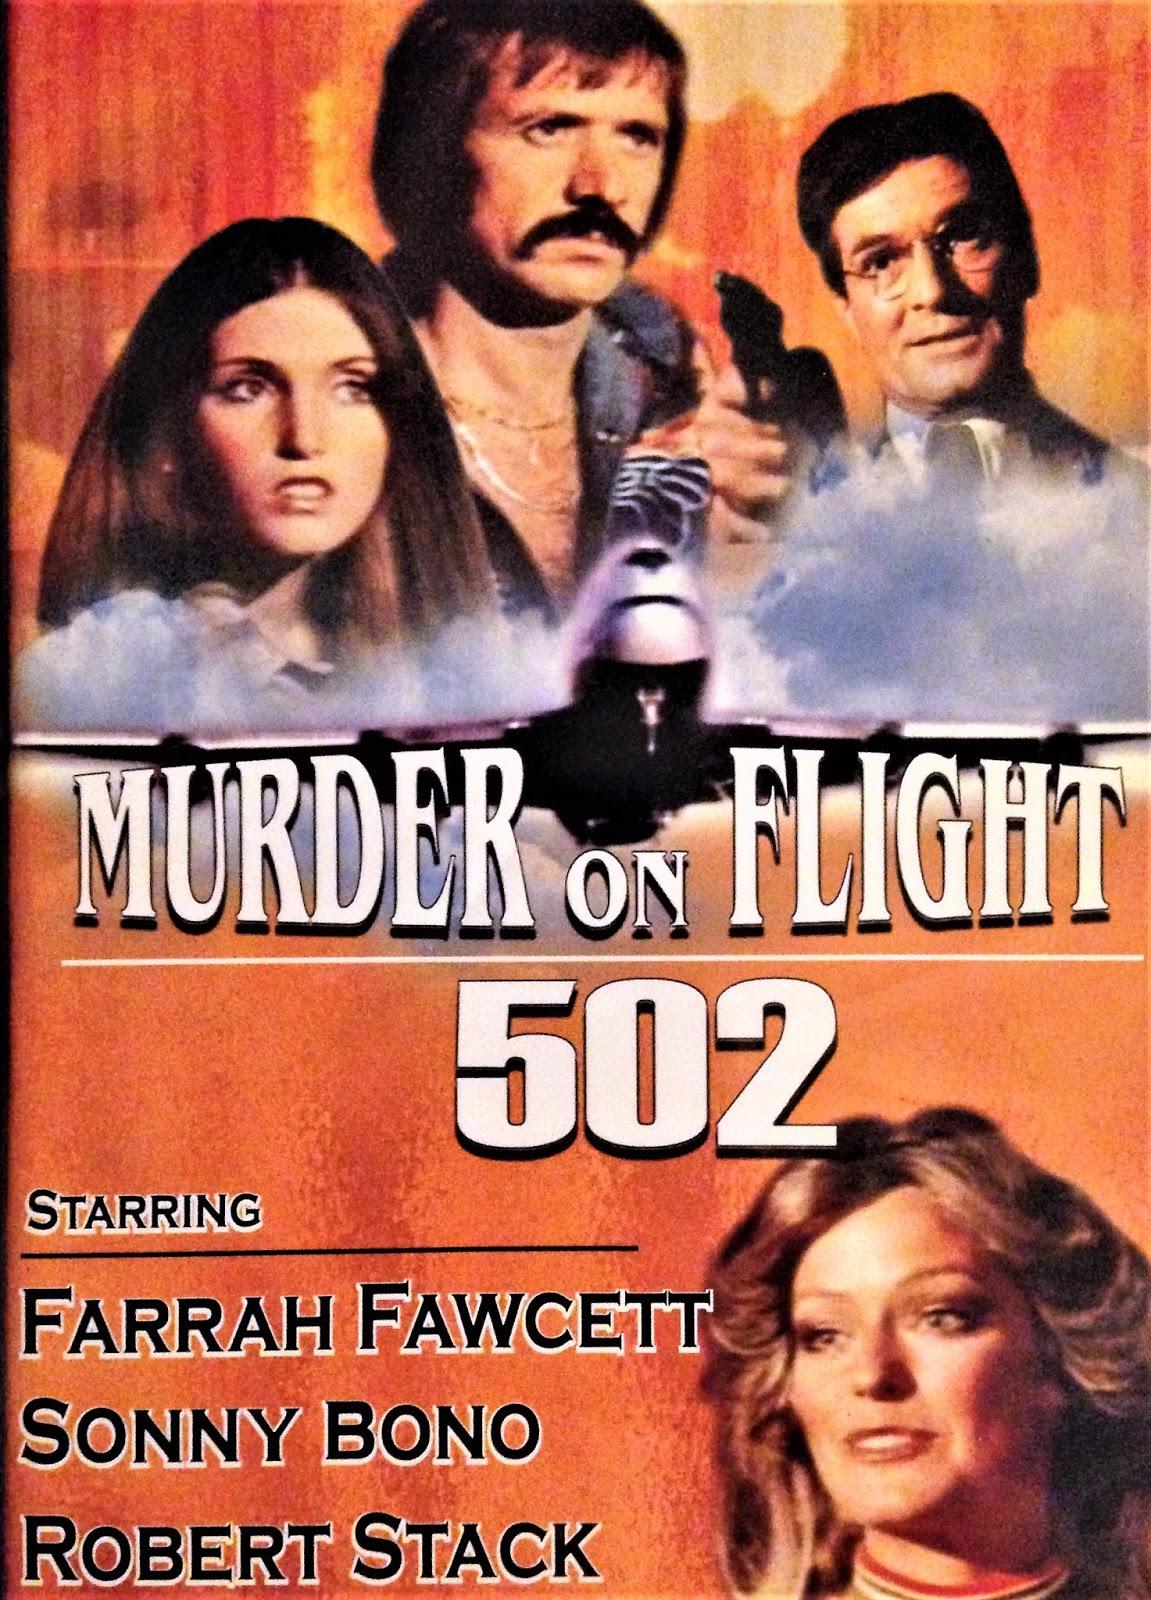 The CinemaScope Cat: Murder On Flight 502 (1975)